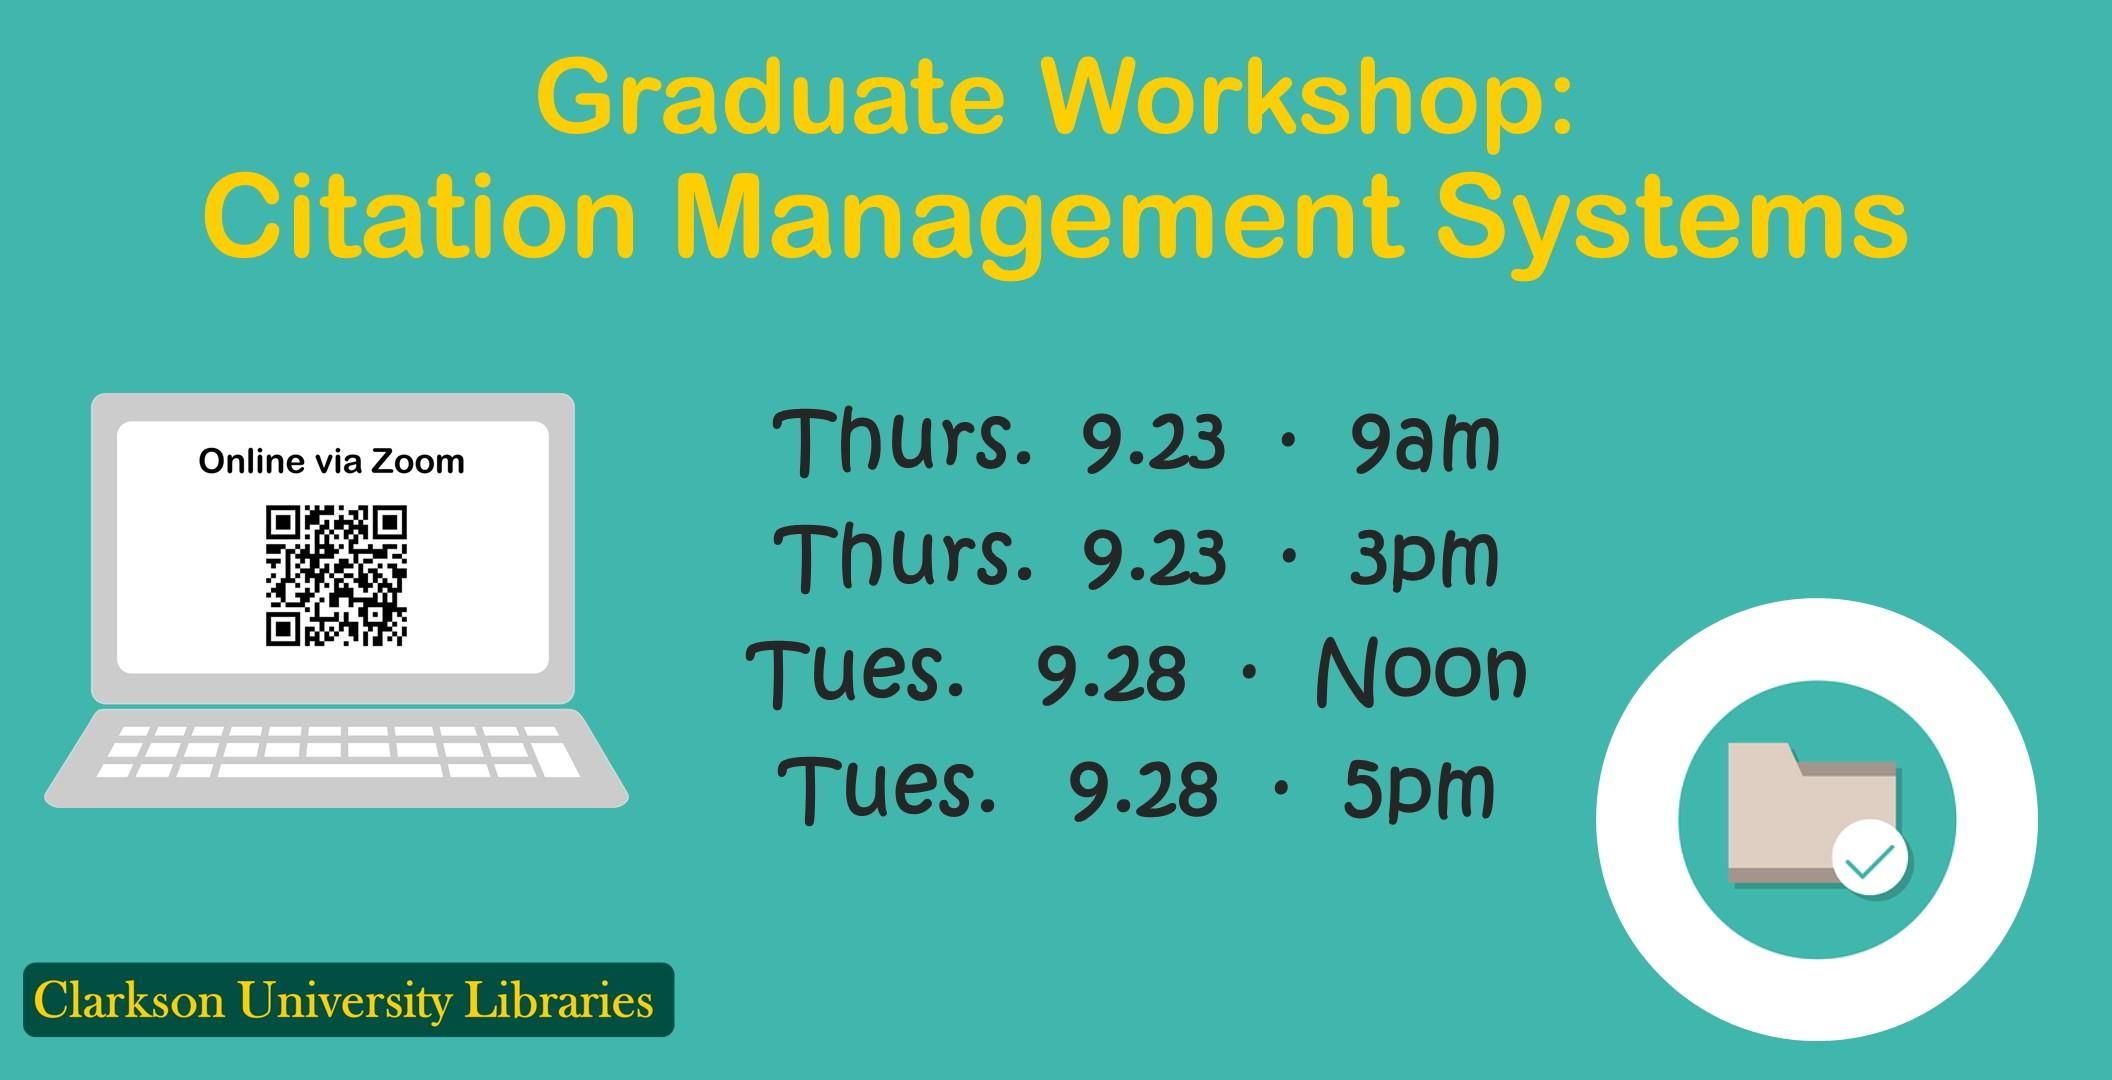 Graduate Workshop TODAY: Citation Management Systems